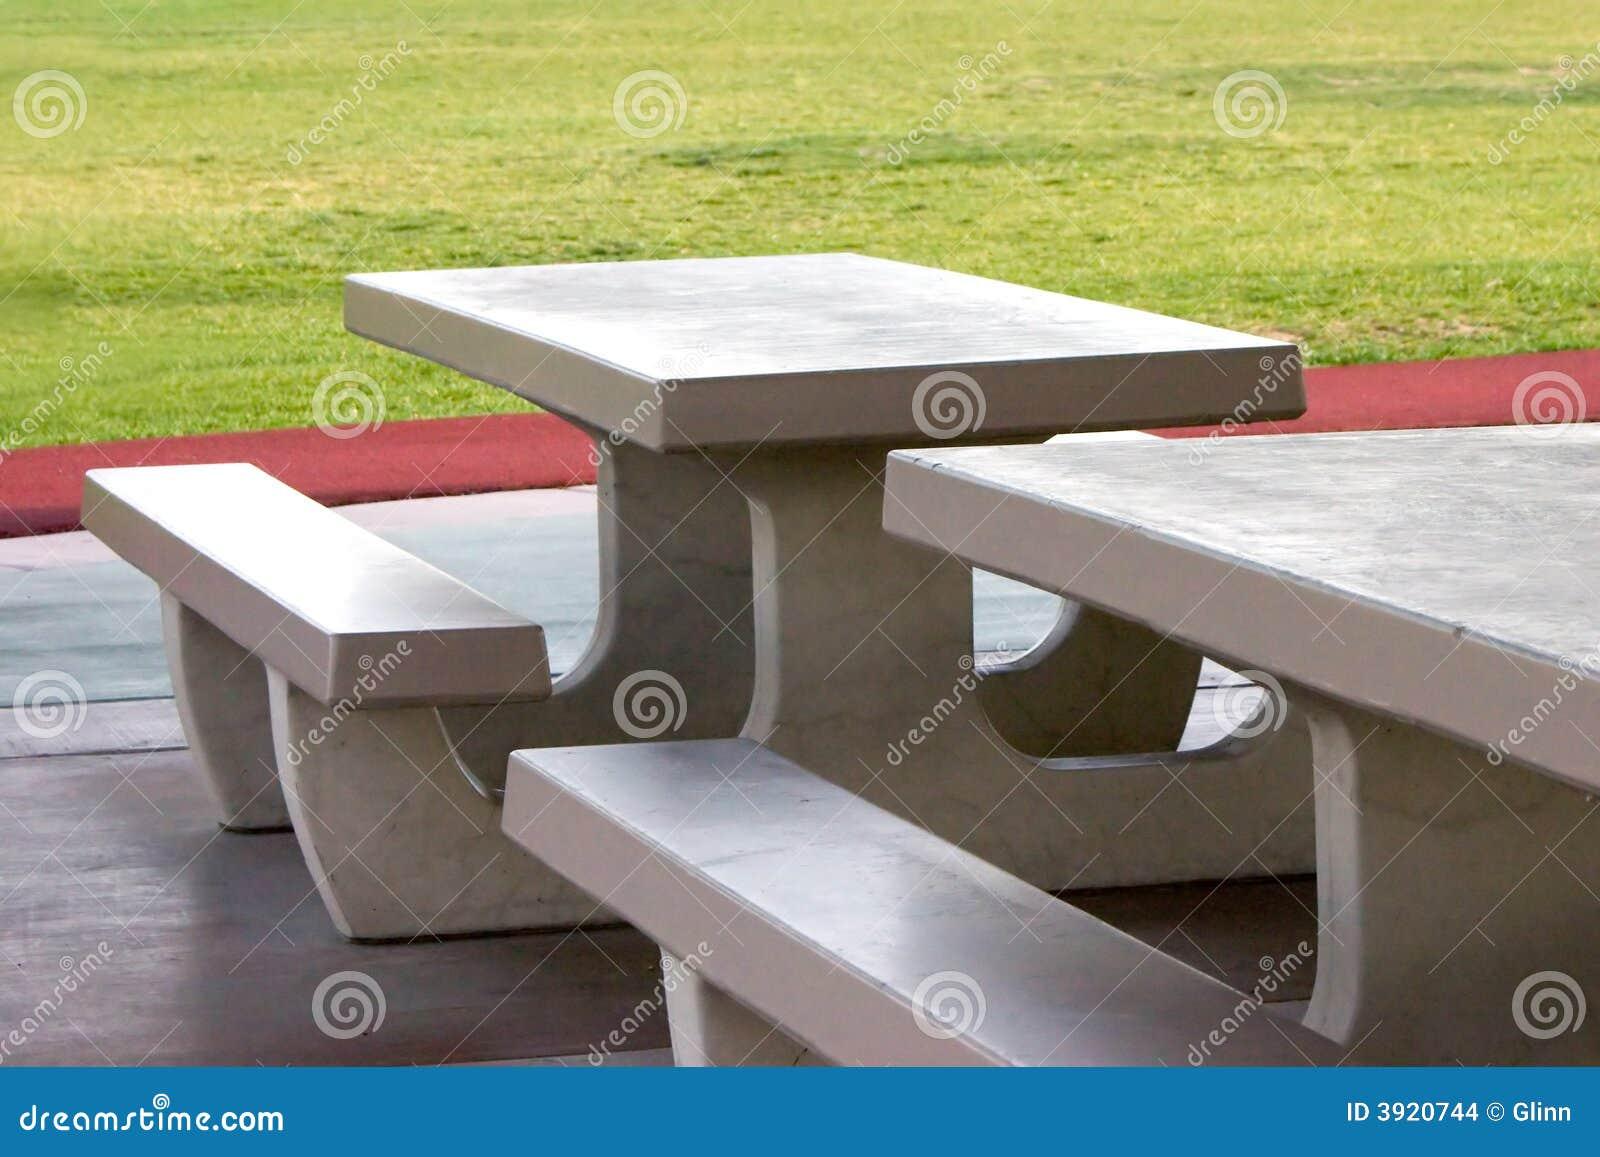 Concrete picknicklijsten